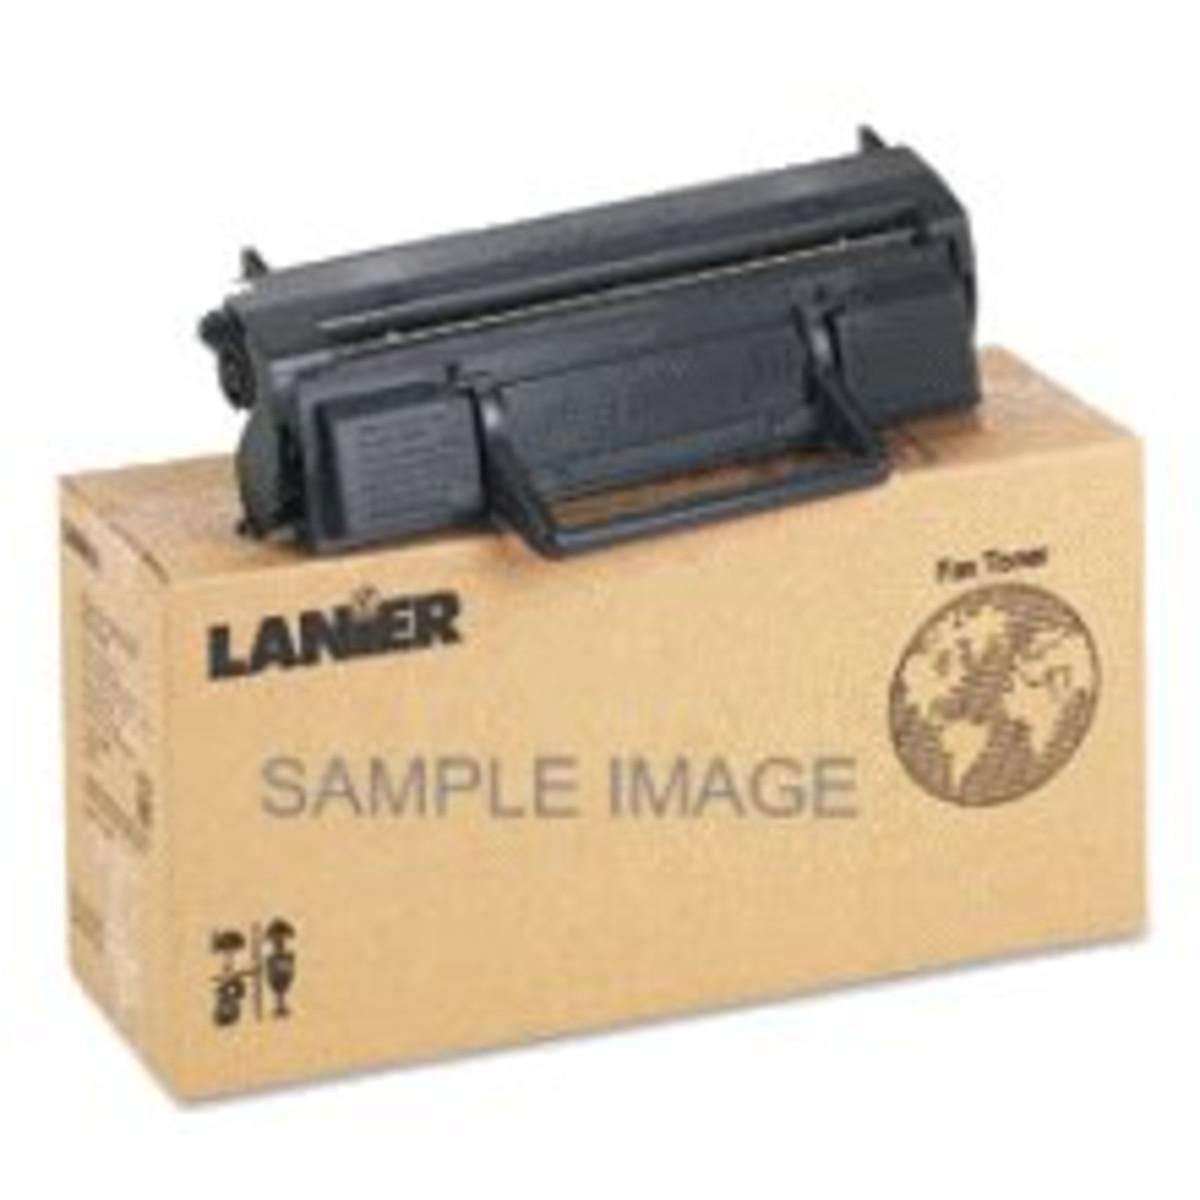 Lanier 841-260 Black Toner Cartridge